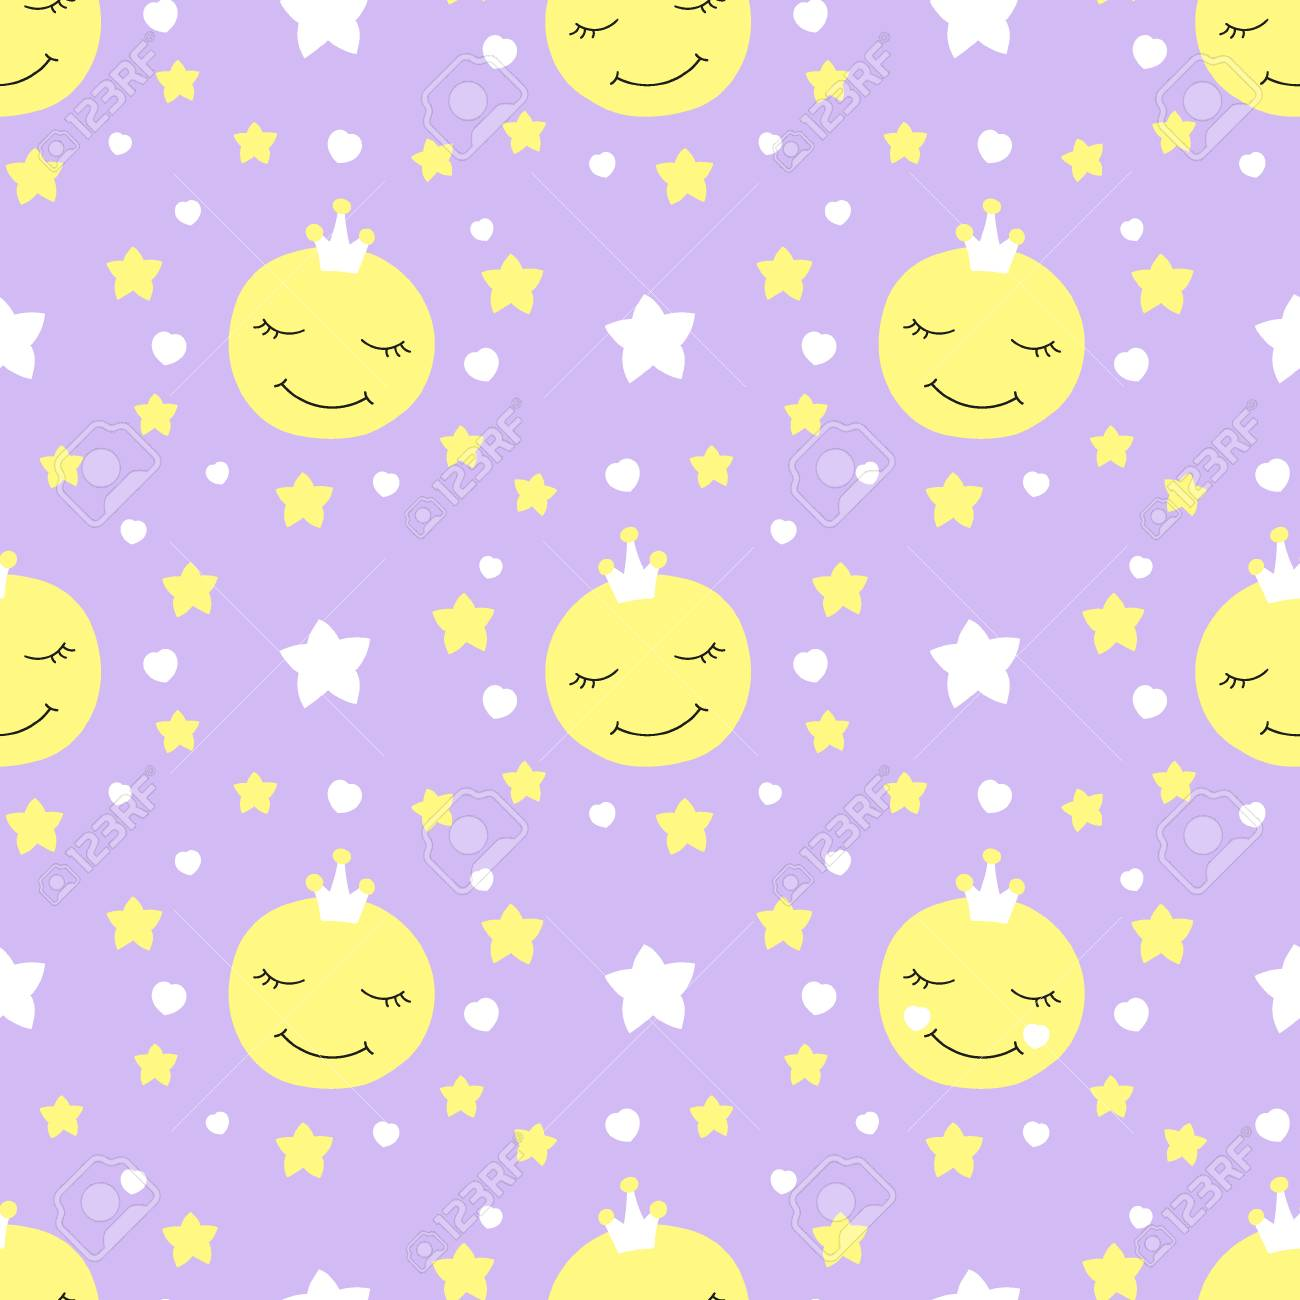 cute baby moon pattern vector seamless. princess print with eyelash